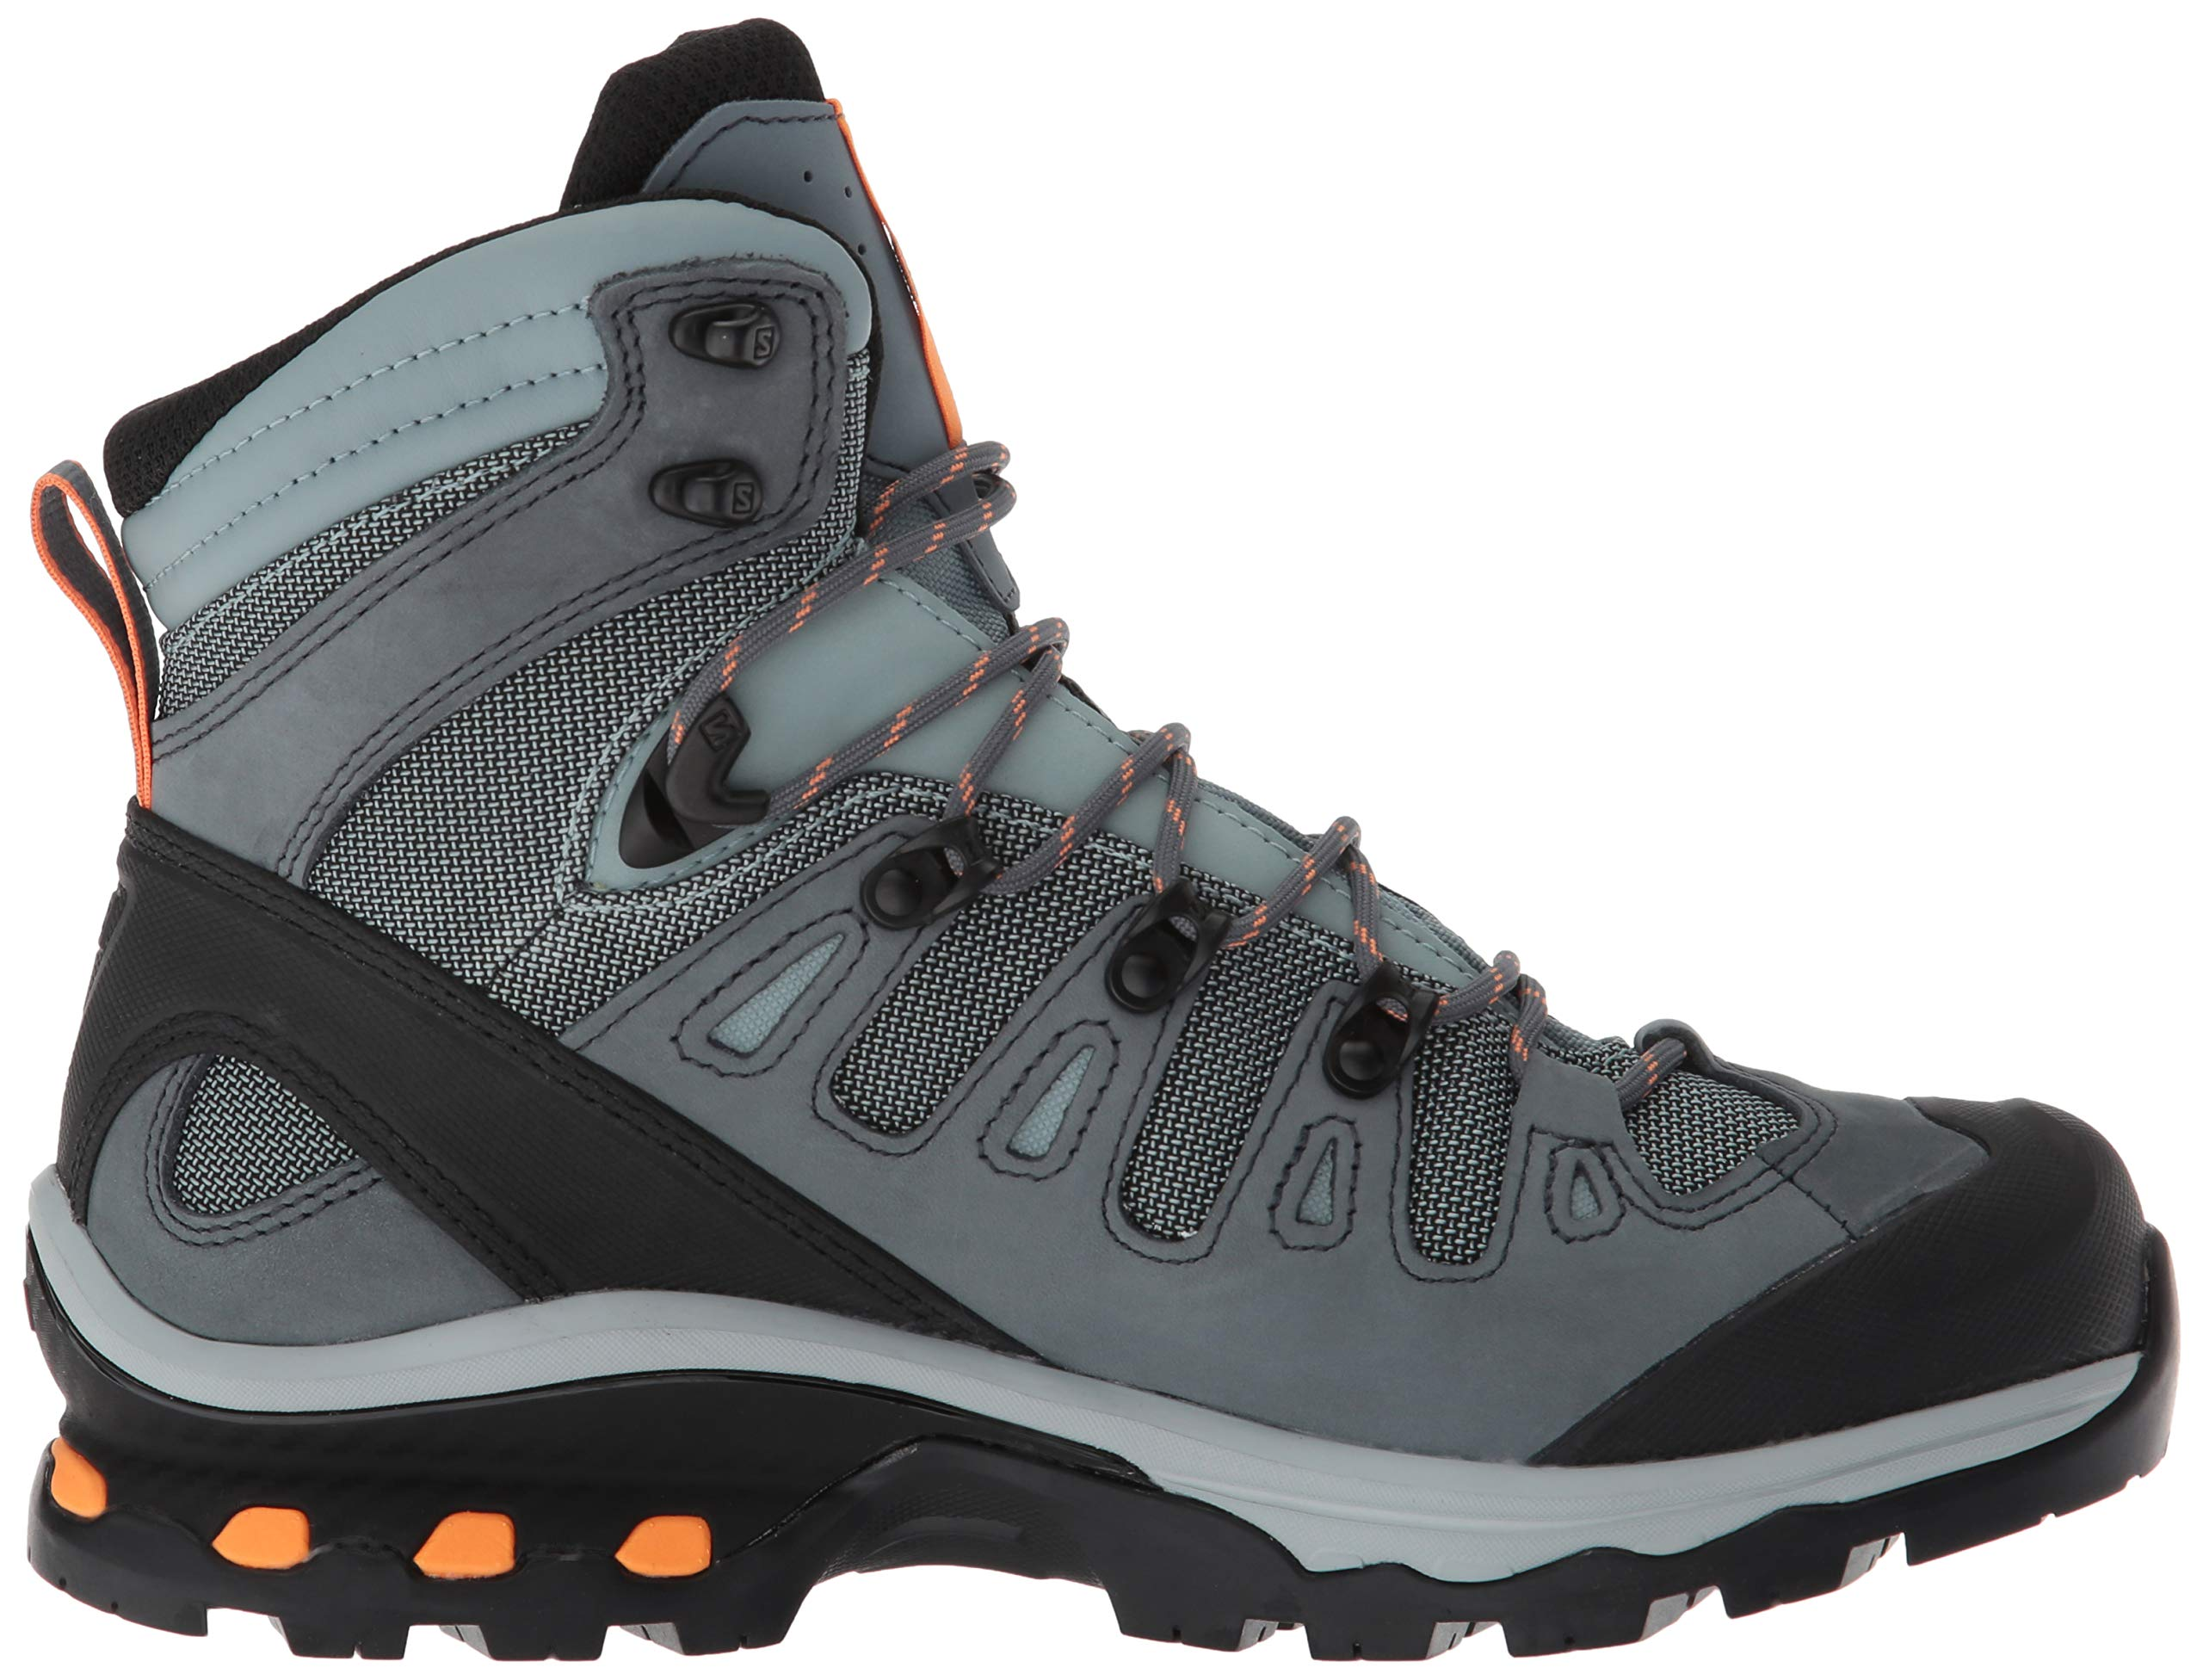 SALOMON Women's Quest 4d 3 GTX W High Rise Hiking Boots 7